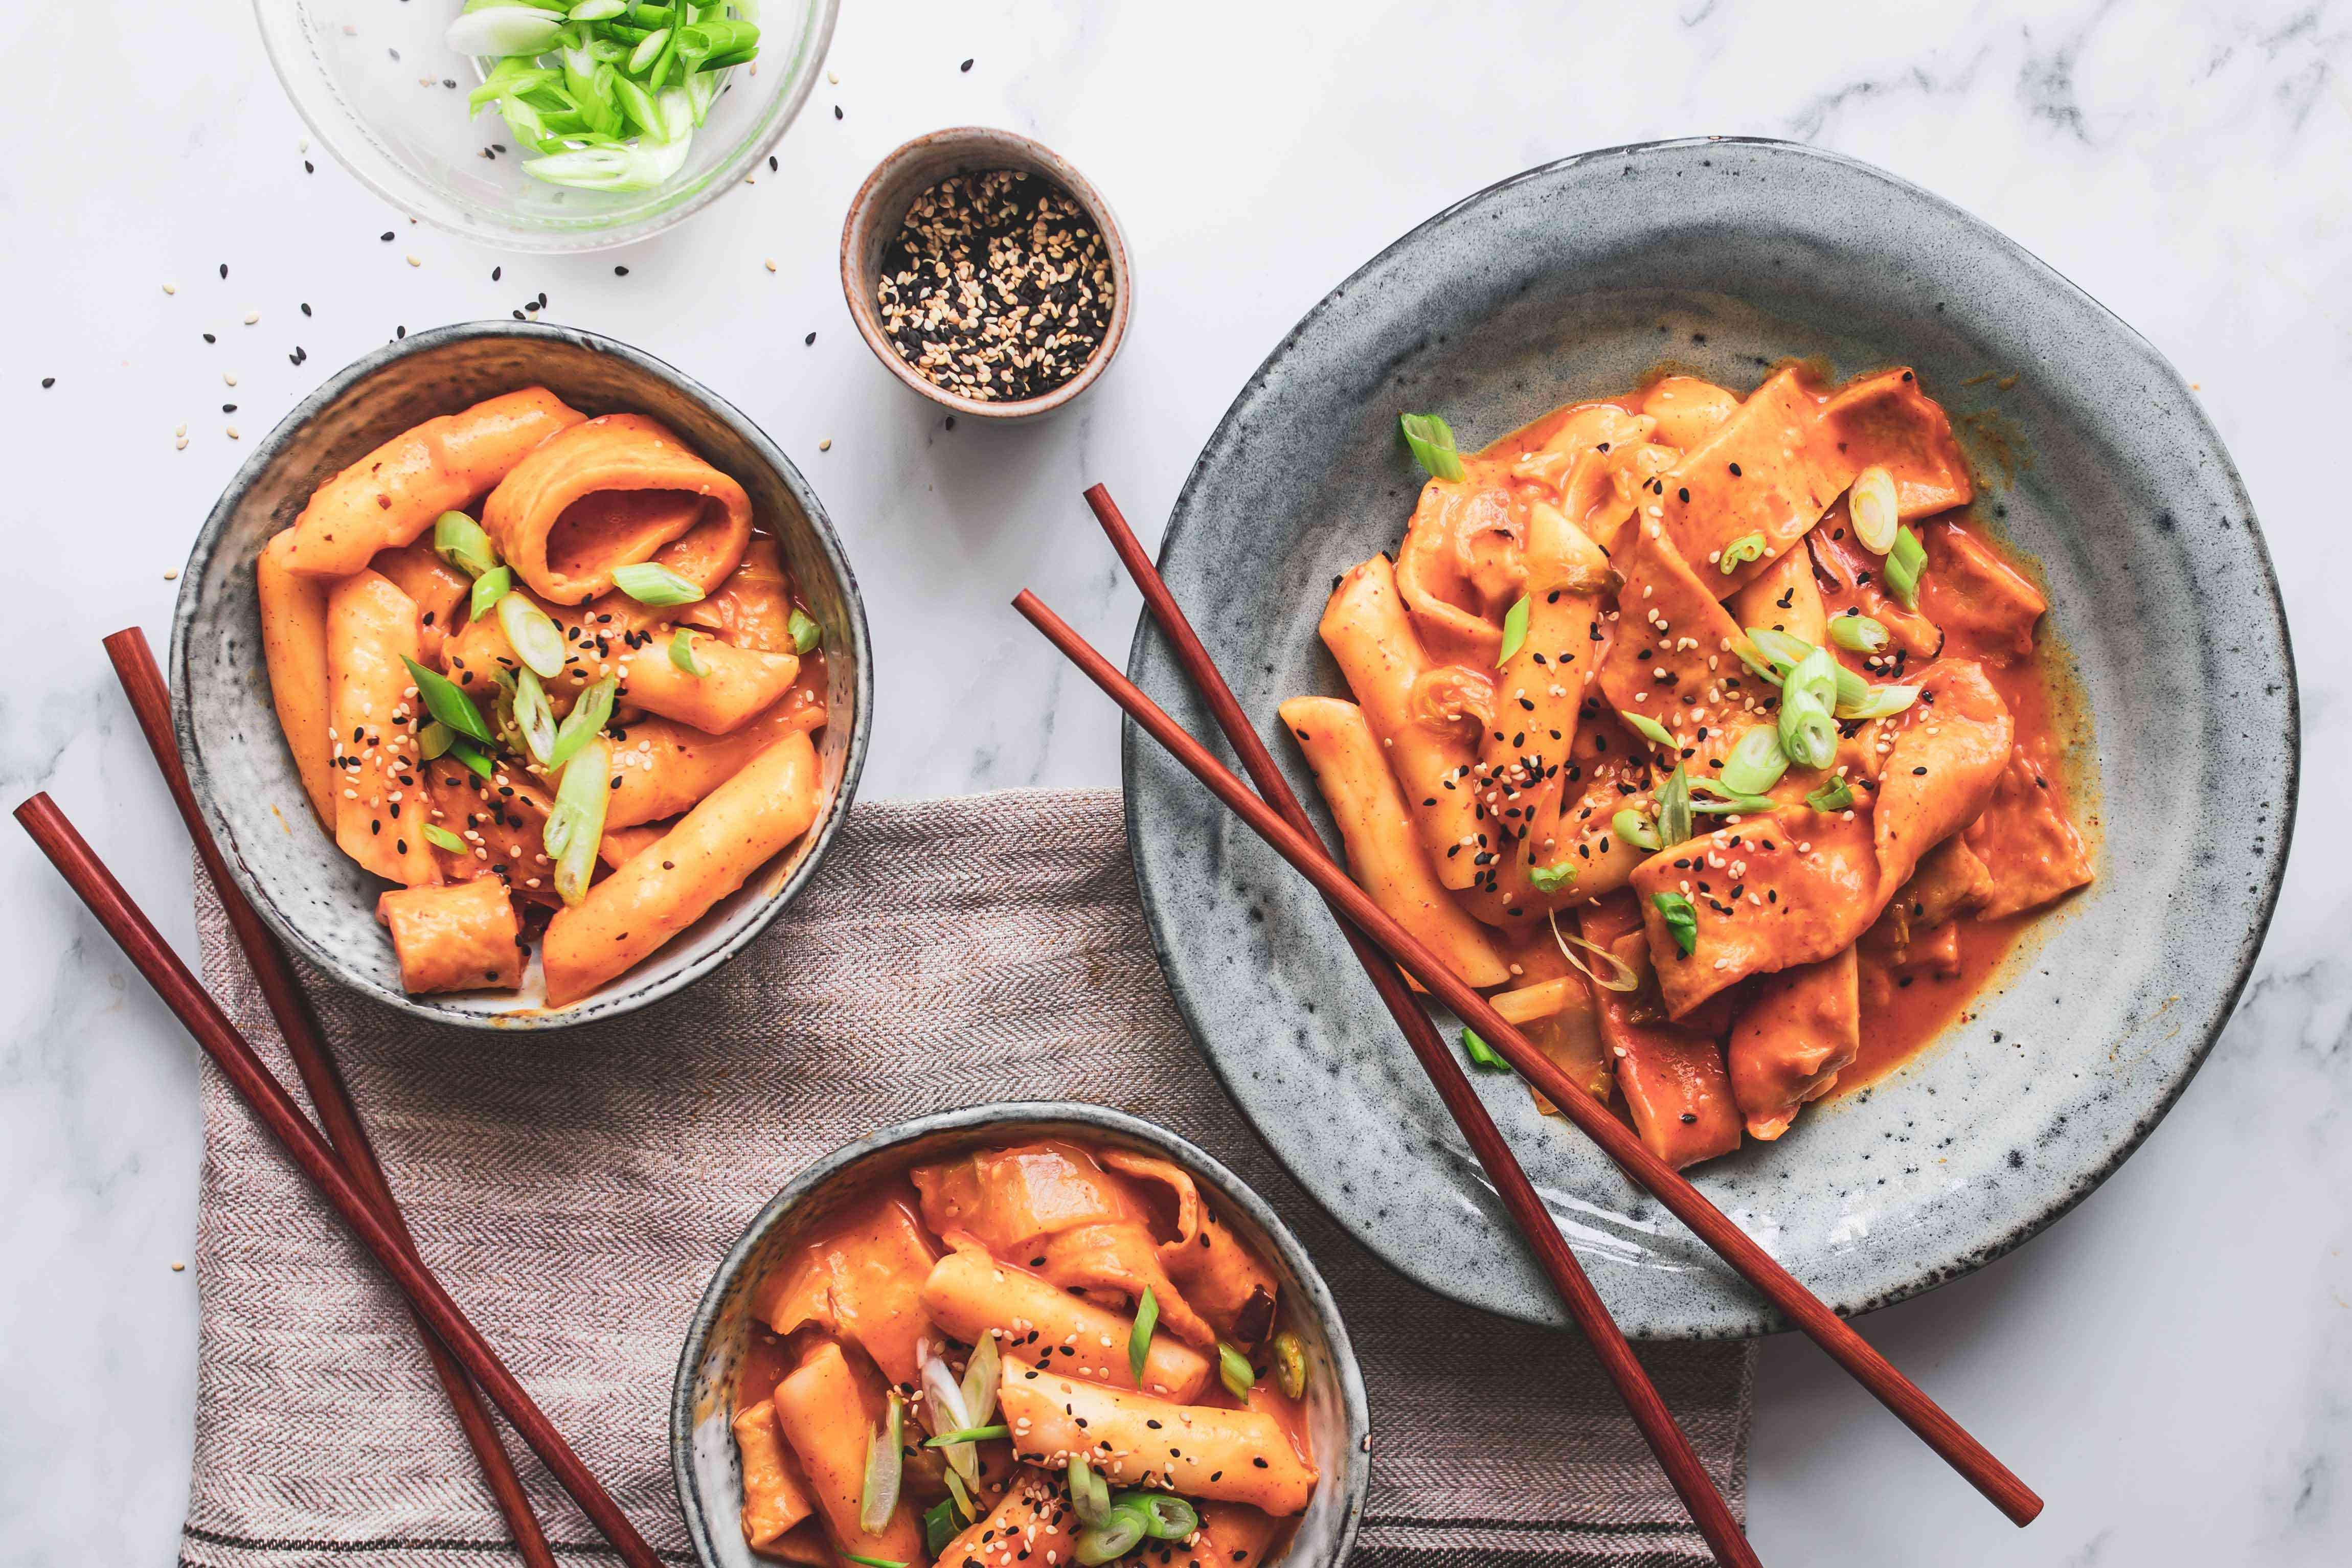 Spicy Korean rice cakes duk boki